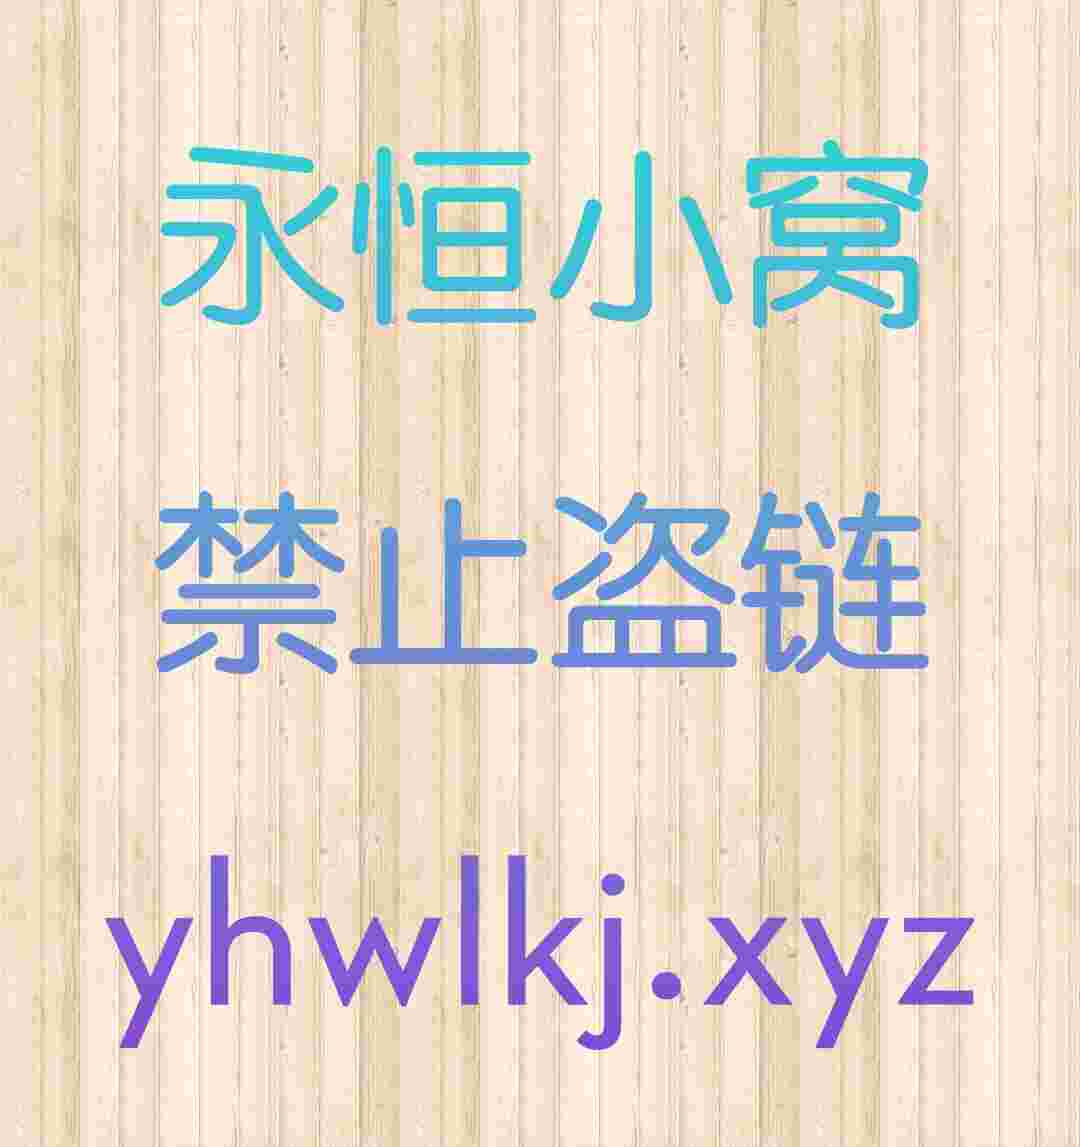 Screenshot_20210224_202725_org.mozilla.firefox_edit_41417704061908.jpg